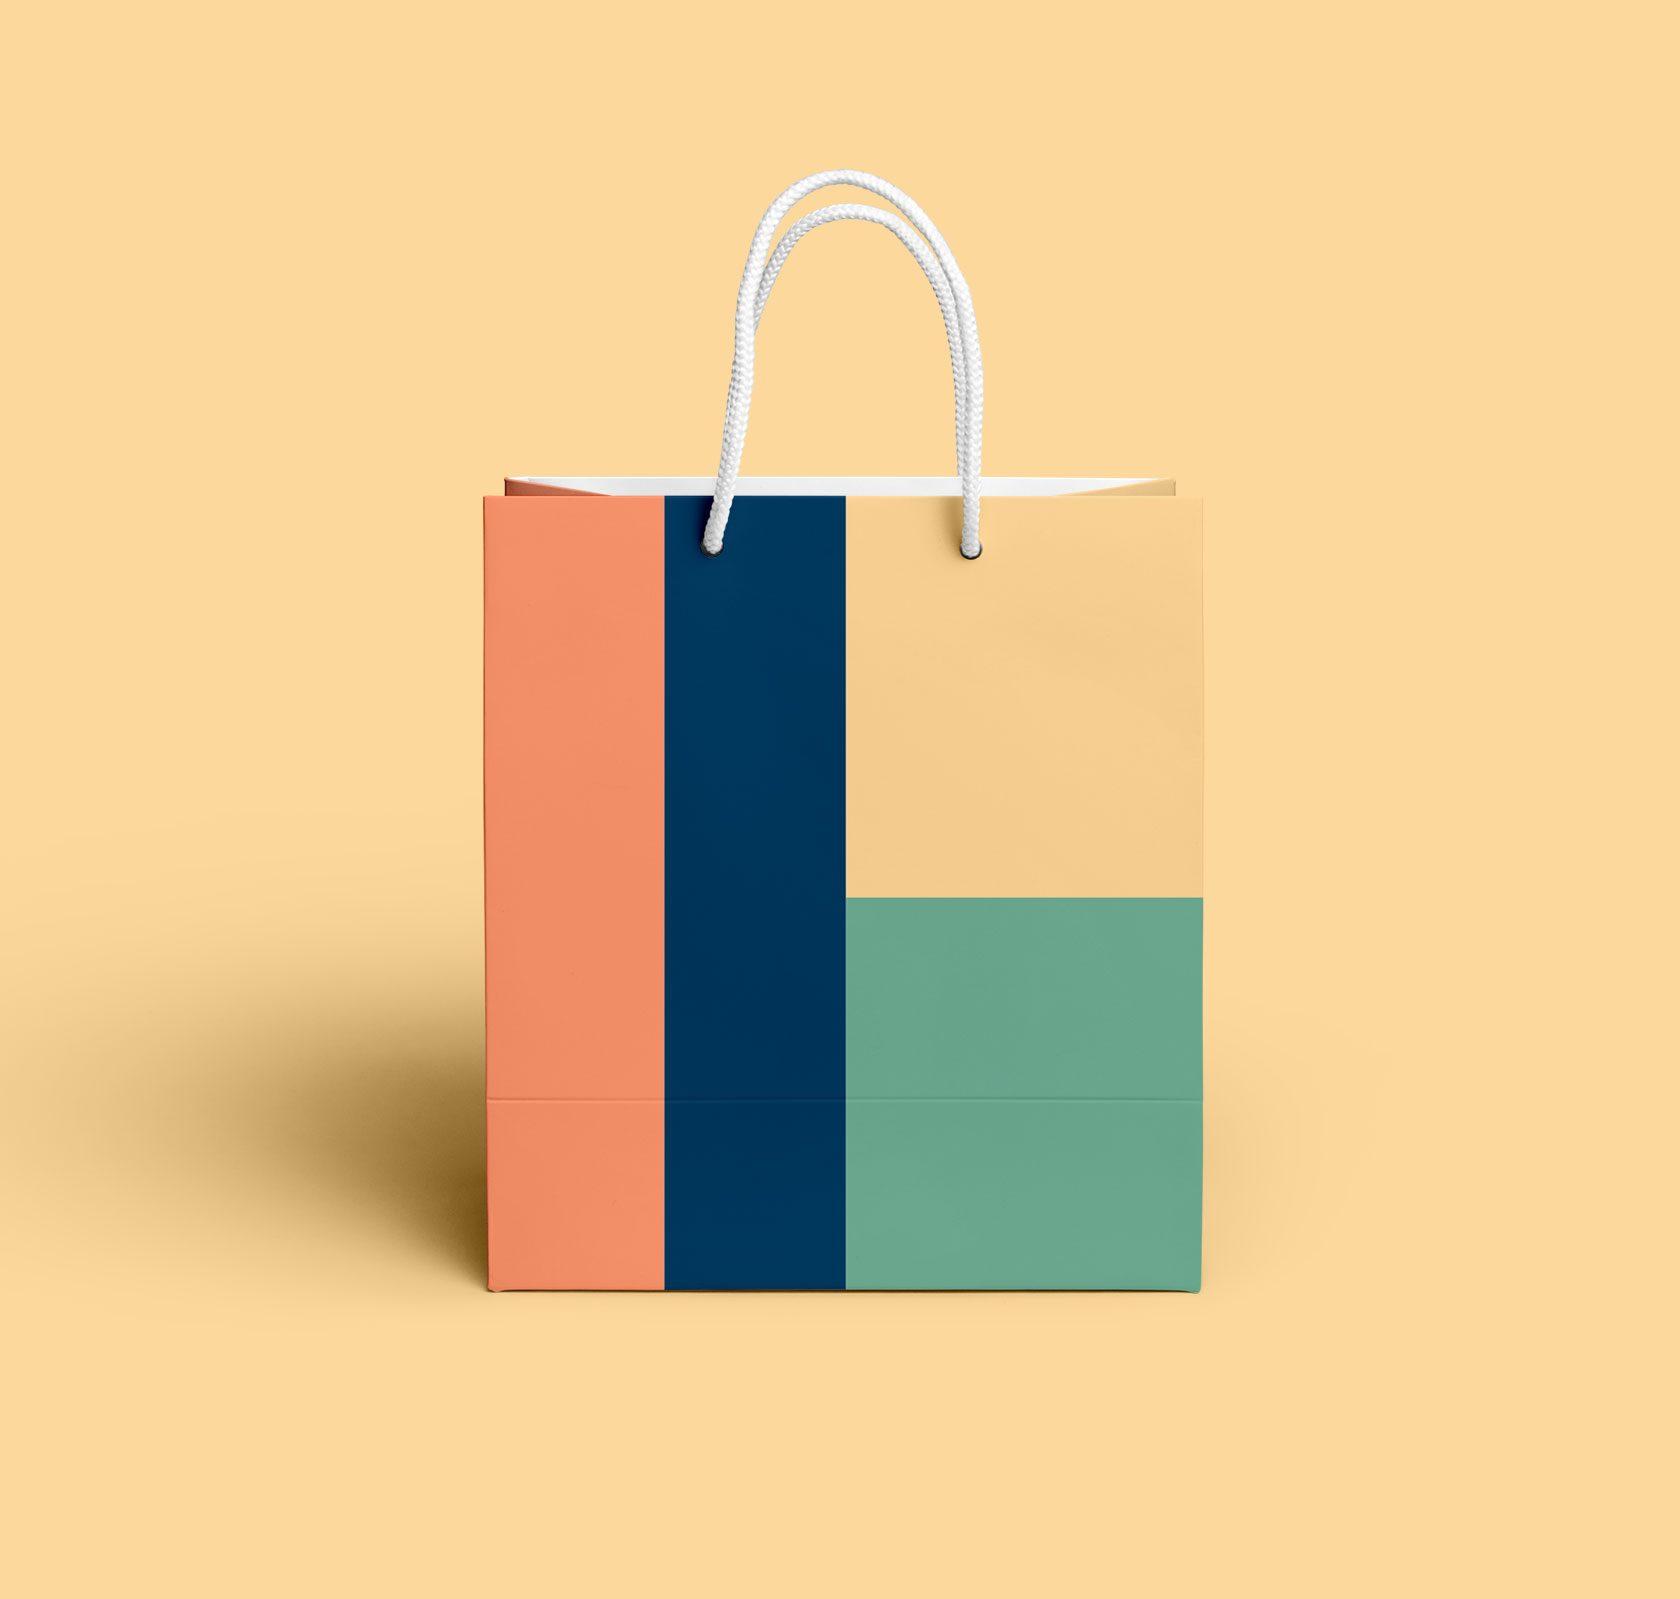 Petite Ocean Shopping Bag Design by Furia